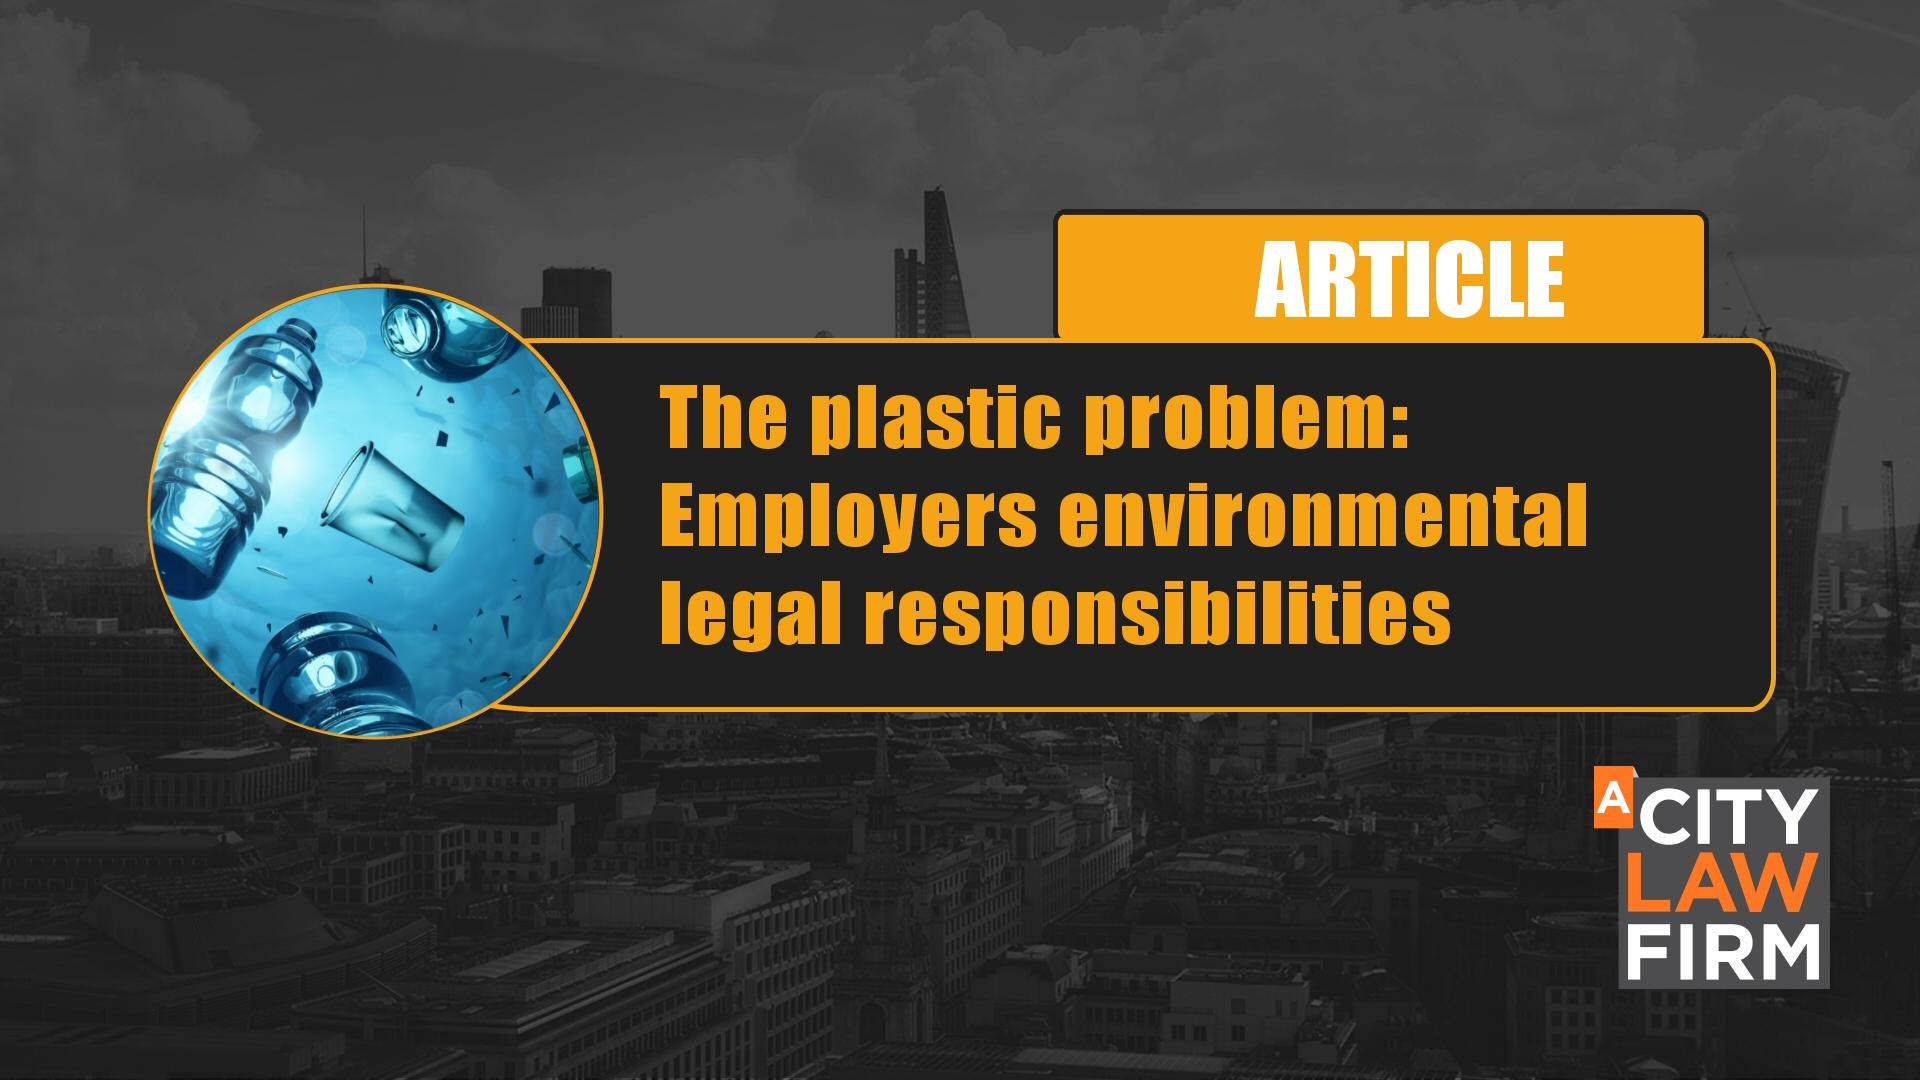 The plastic problem: Employers environmental legal responsibilities